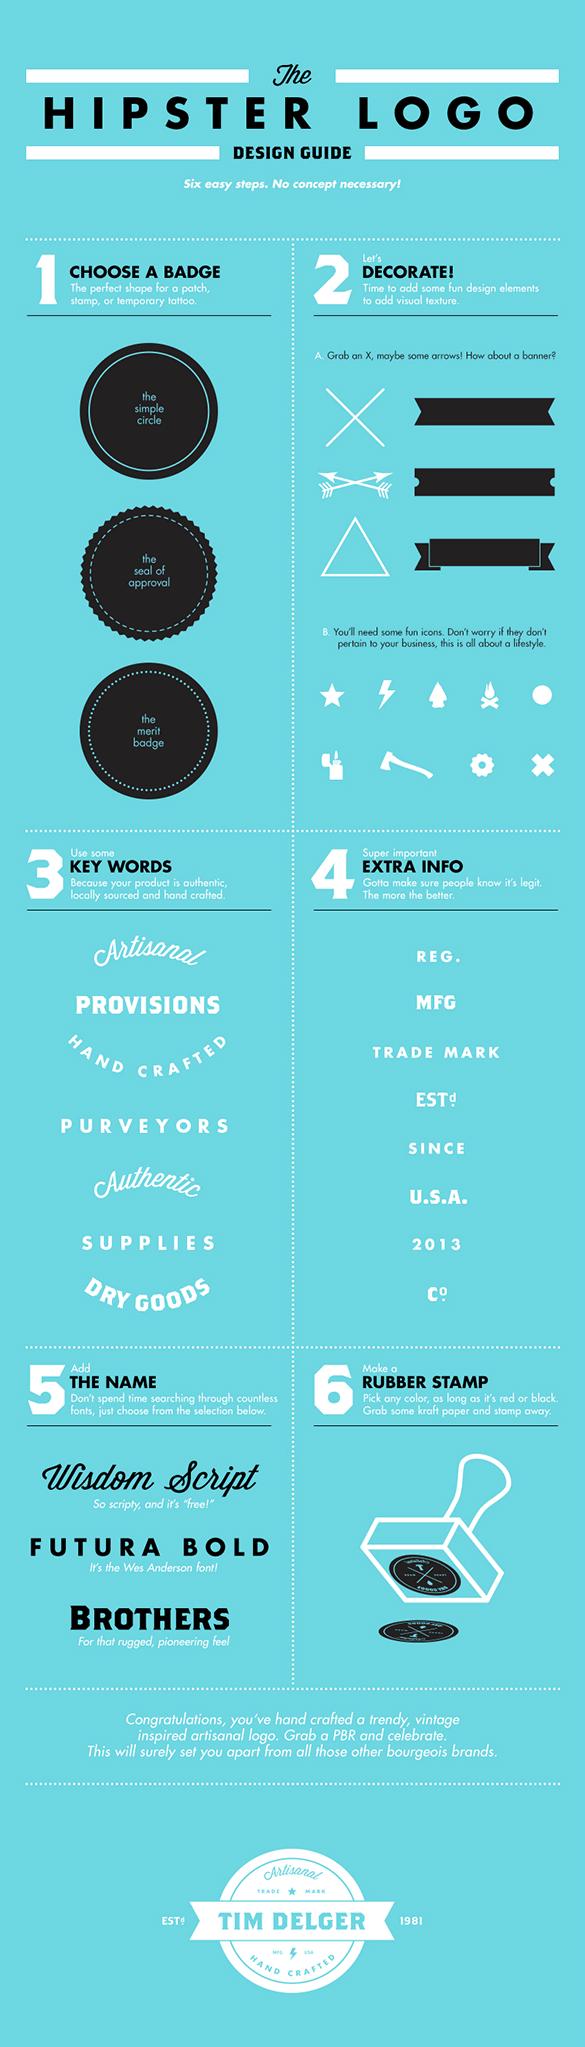 hipster logo design guide